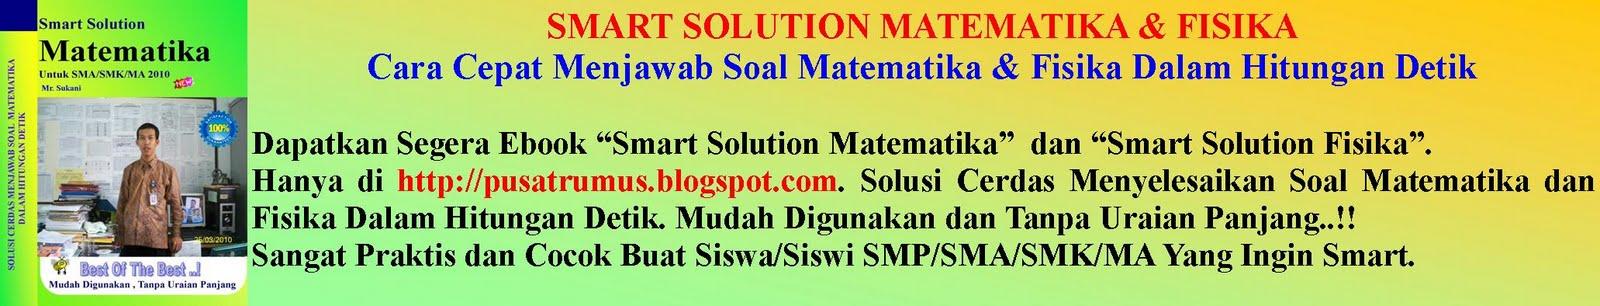 Soal Un Ipa Smp Tahun 2007 Download Soal Un Ipa Newhairstylesformen2014 Com